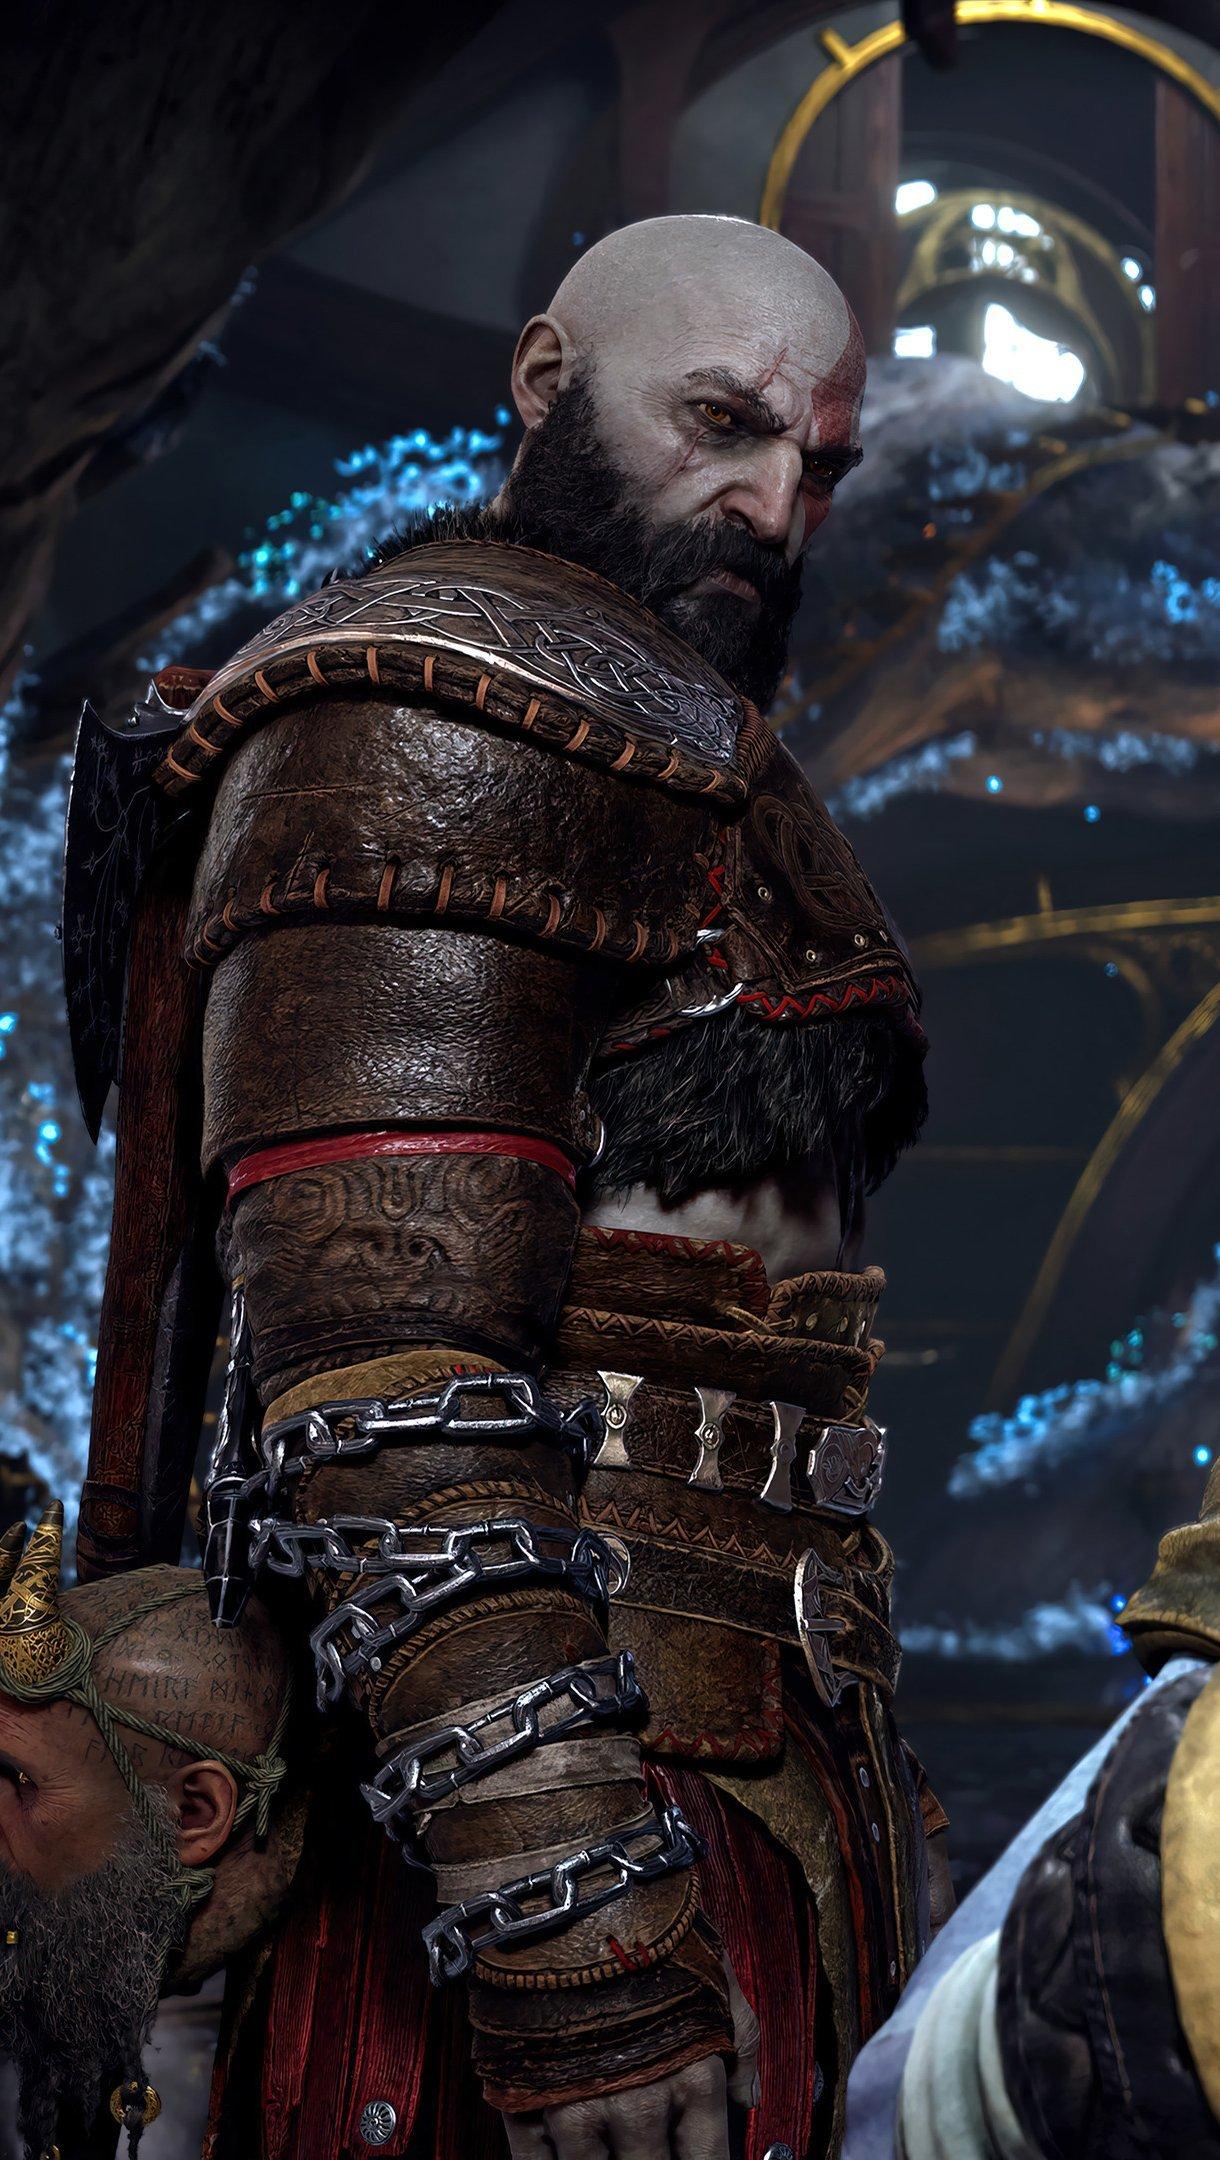 Fondos de pantalla Ragnarok Kratos y Atreus God of War Vertical